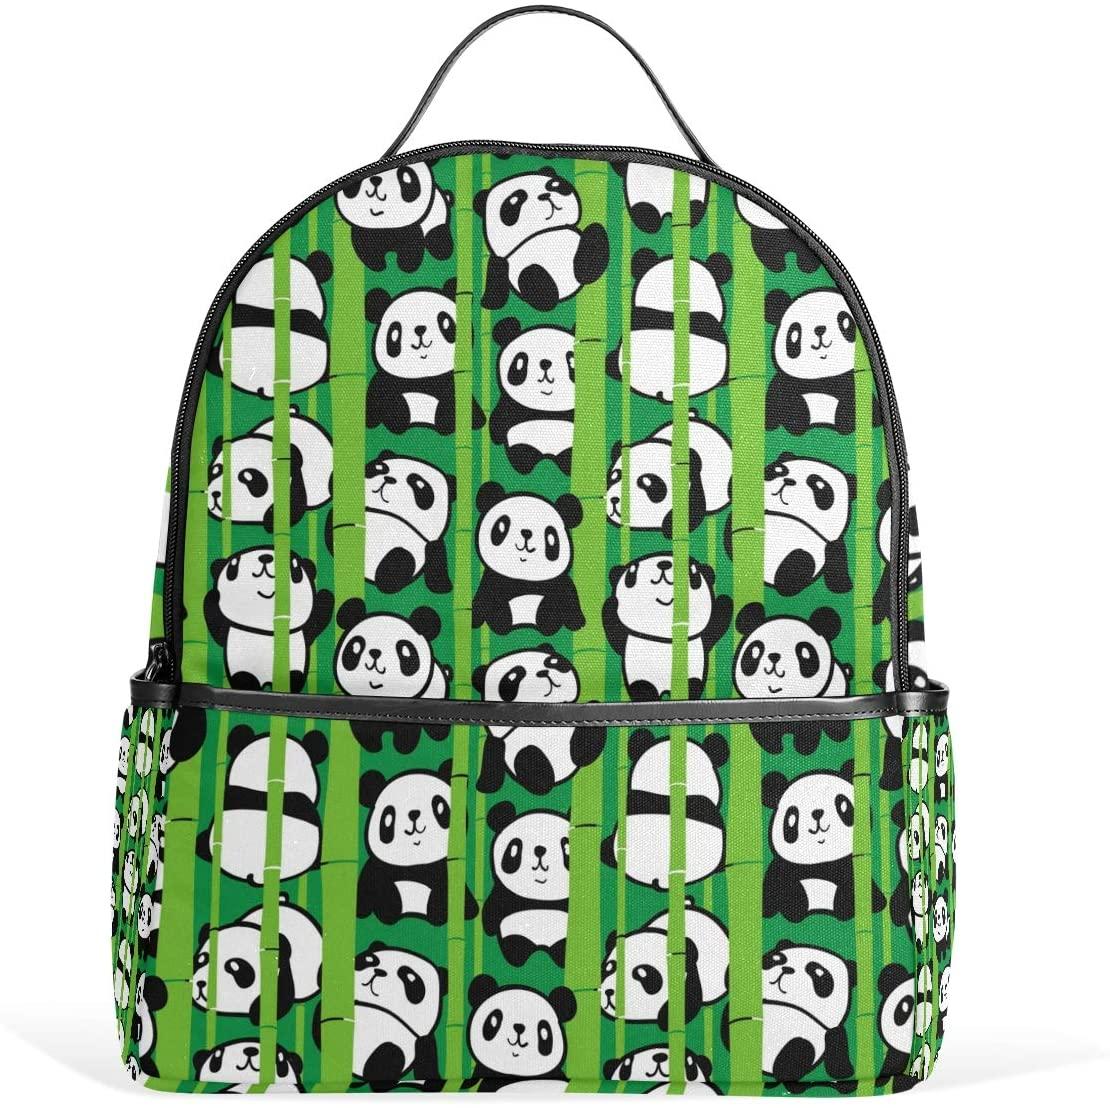 Use4 Cartoon Panda Bamboo Polyester Backpack School Travel Bag